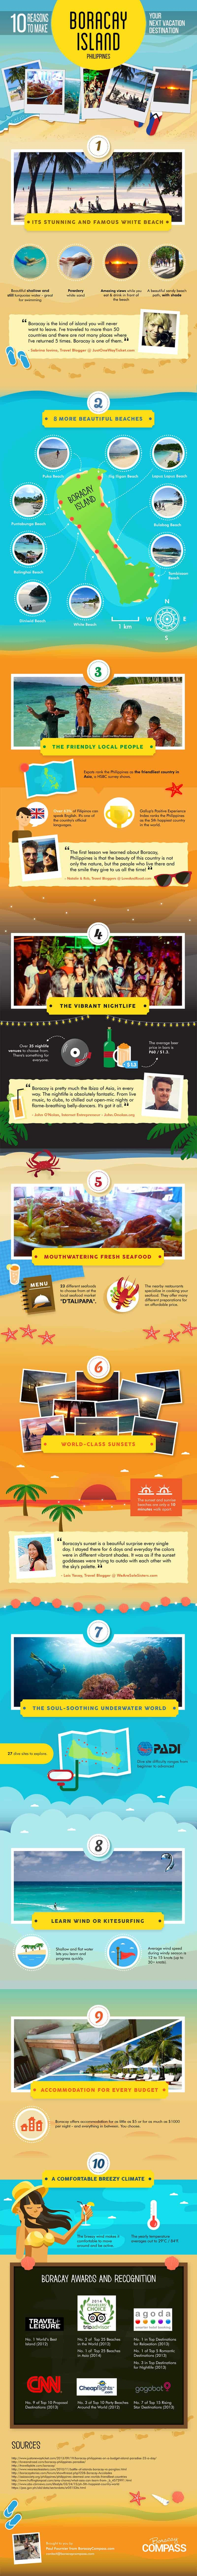 10 Reasons To Make Boracay Island Your Next Vacation Destination